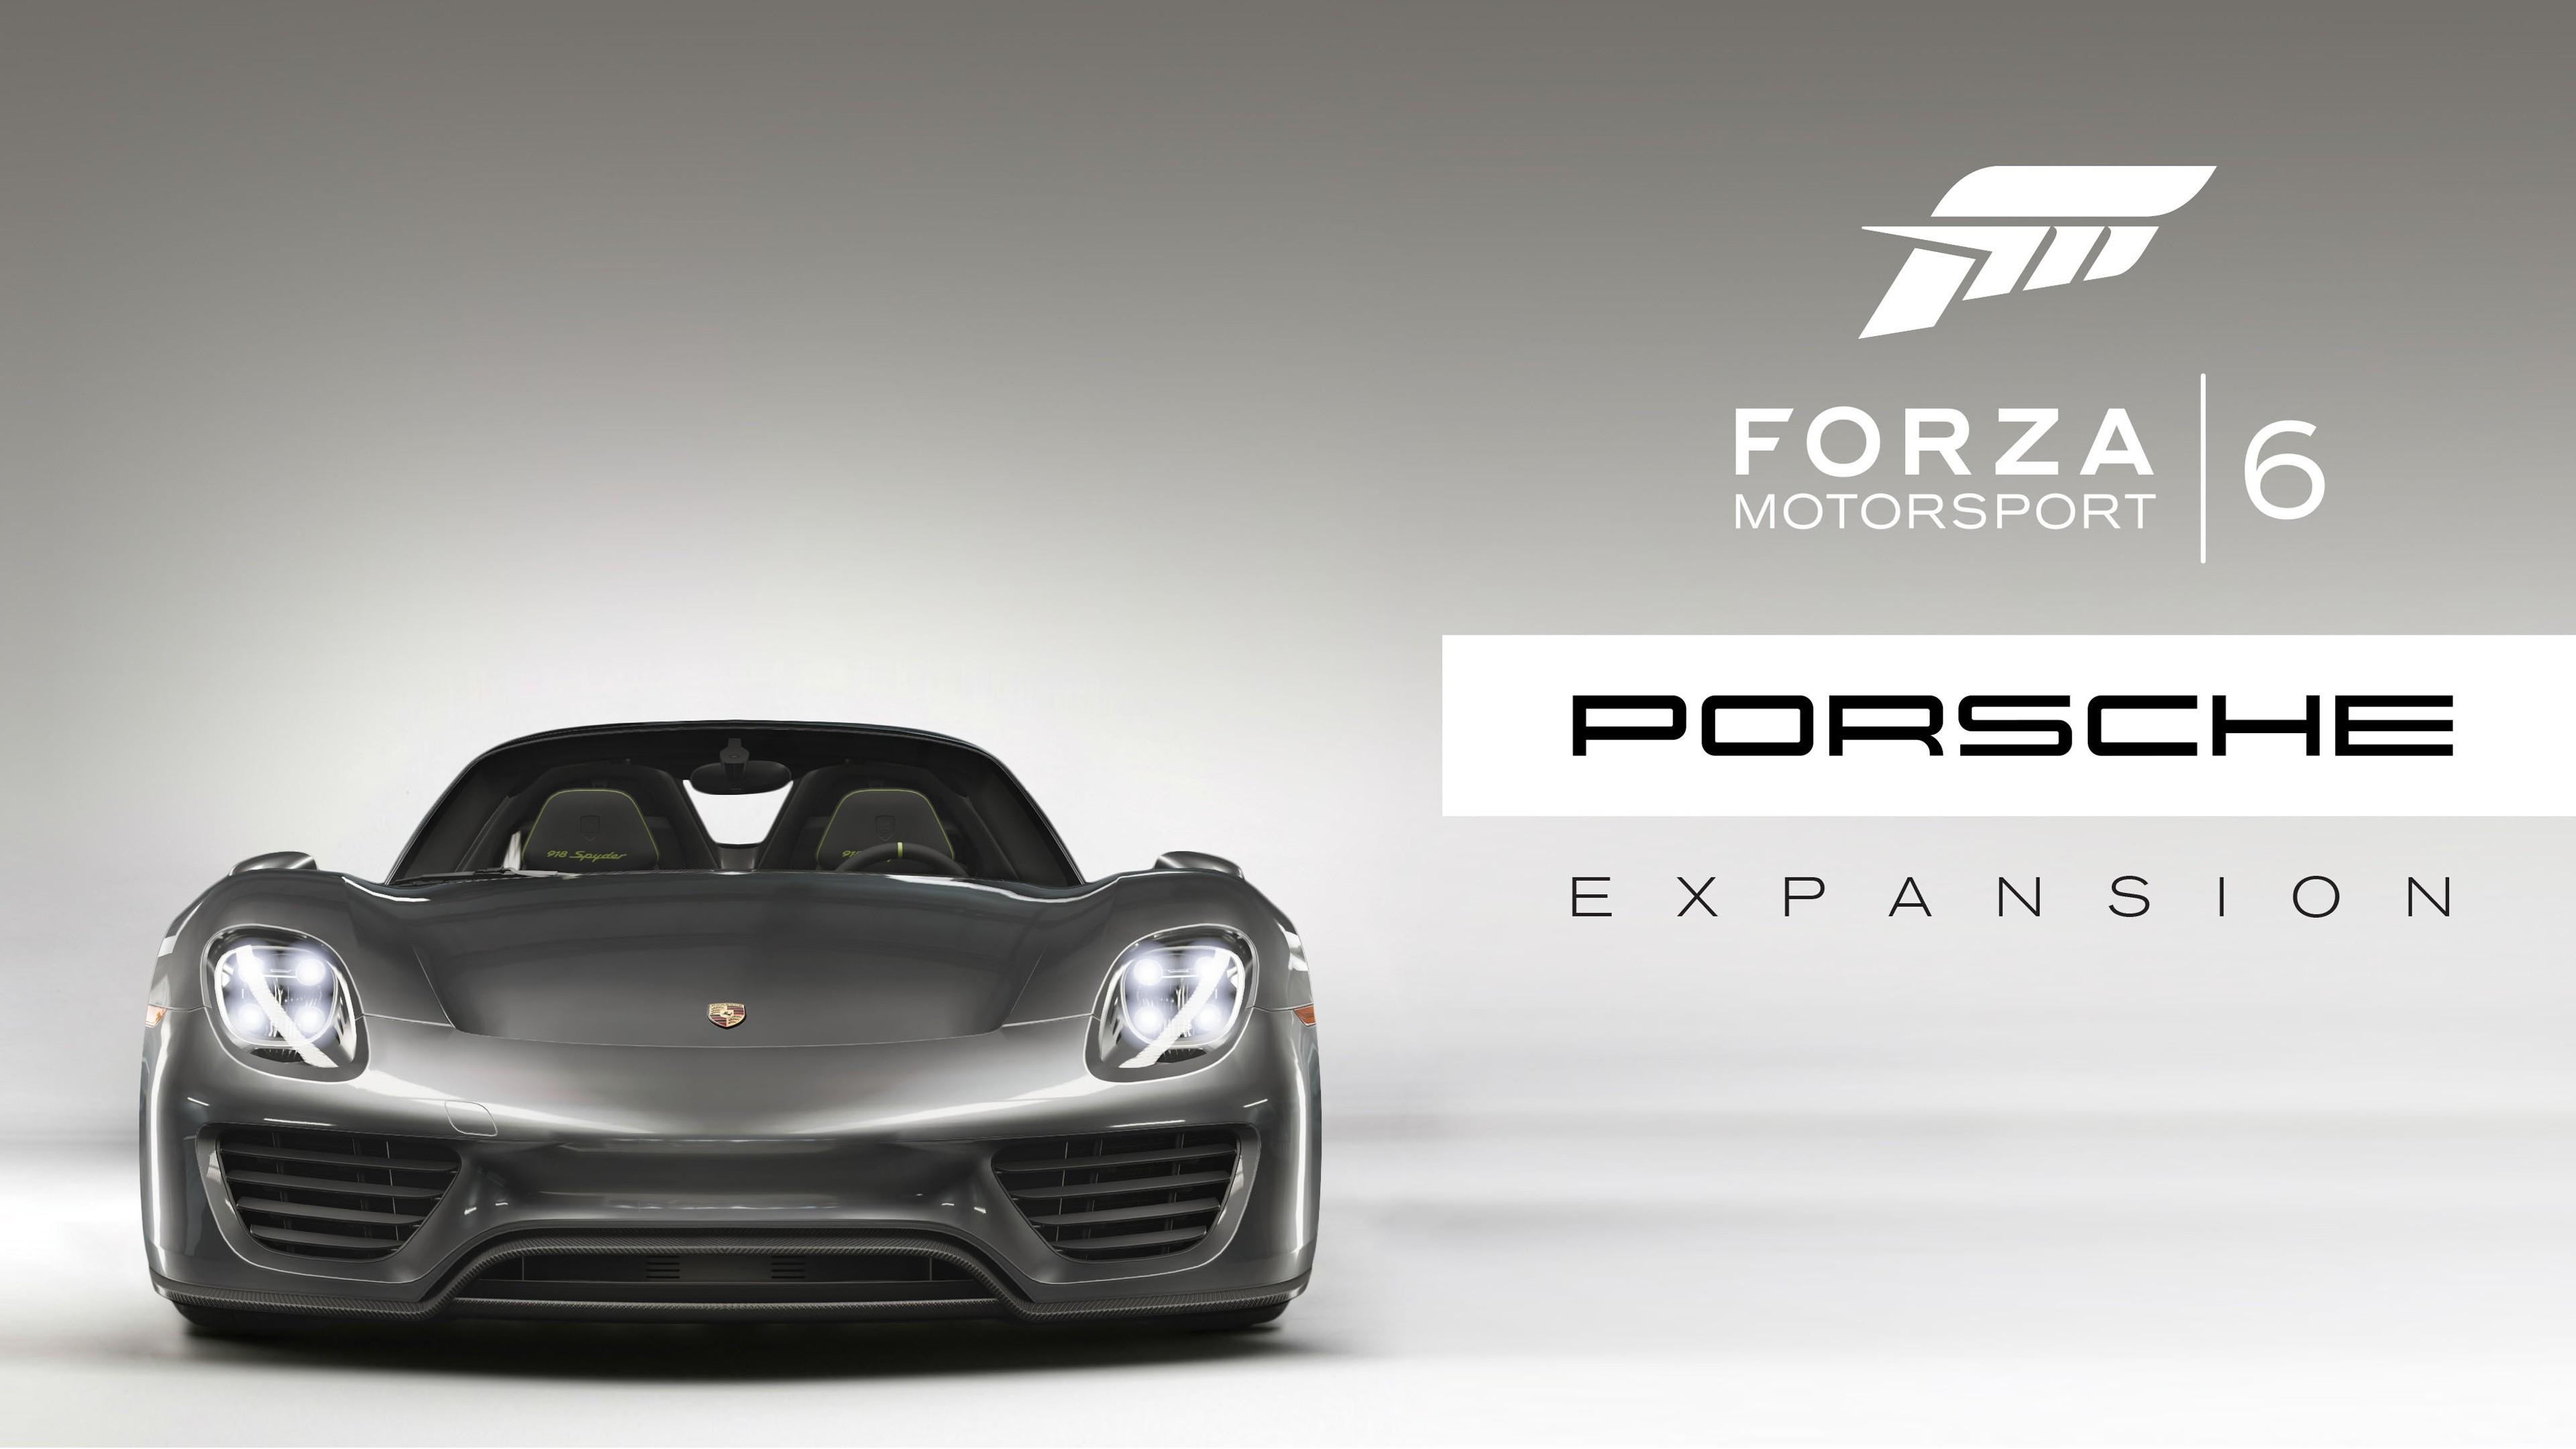 Wallpaper Forza Motorsport 6 Apex Porsche Expansion